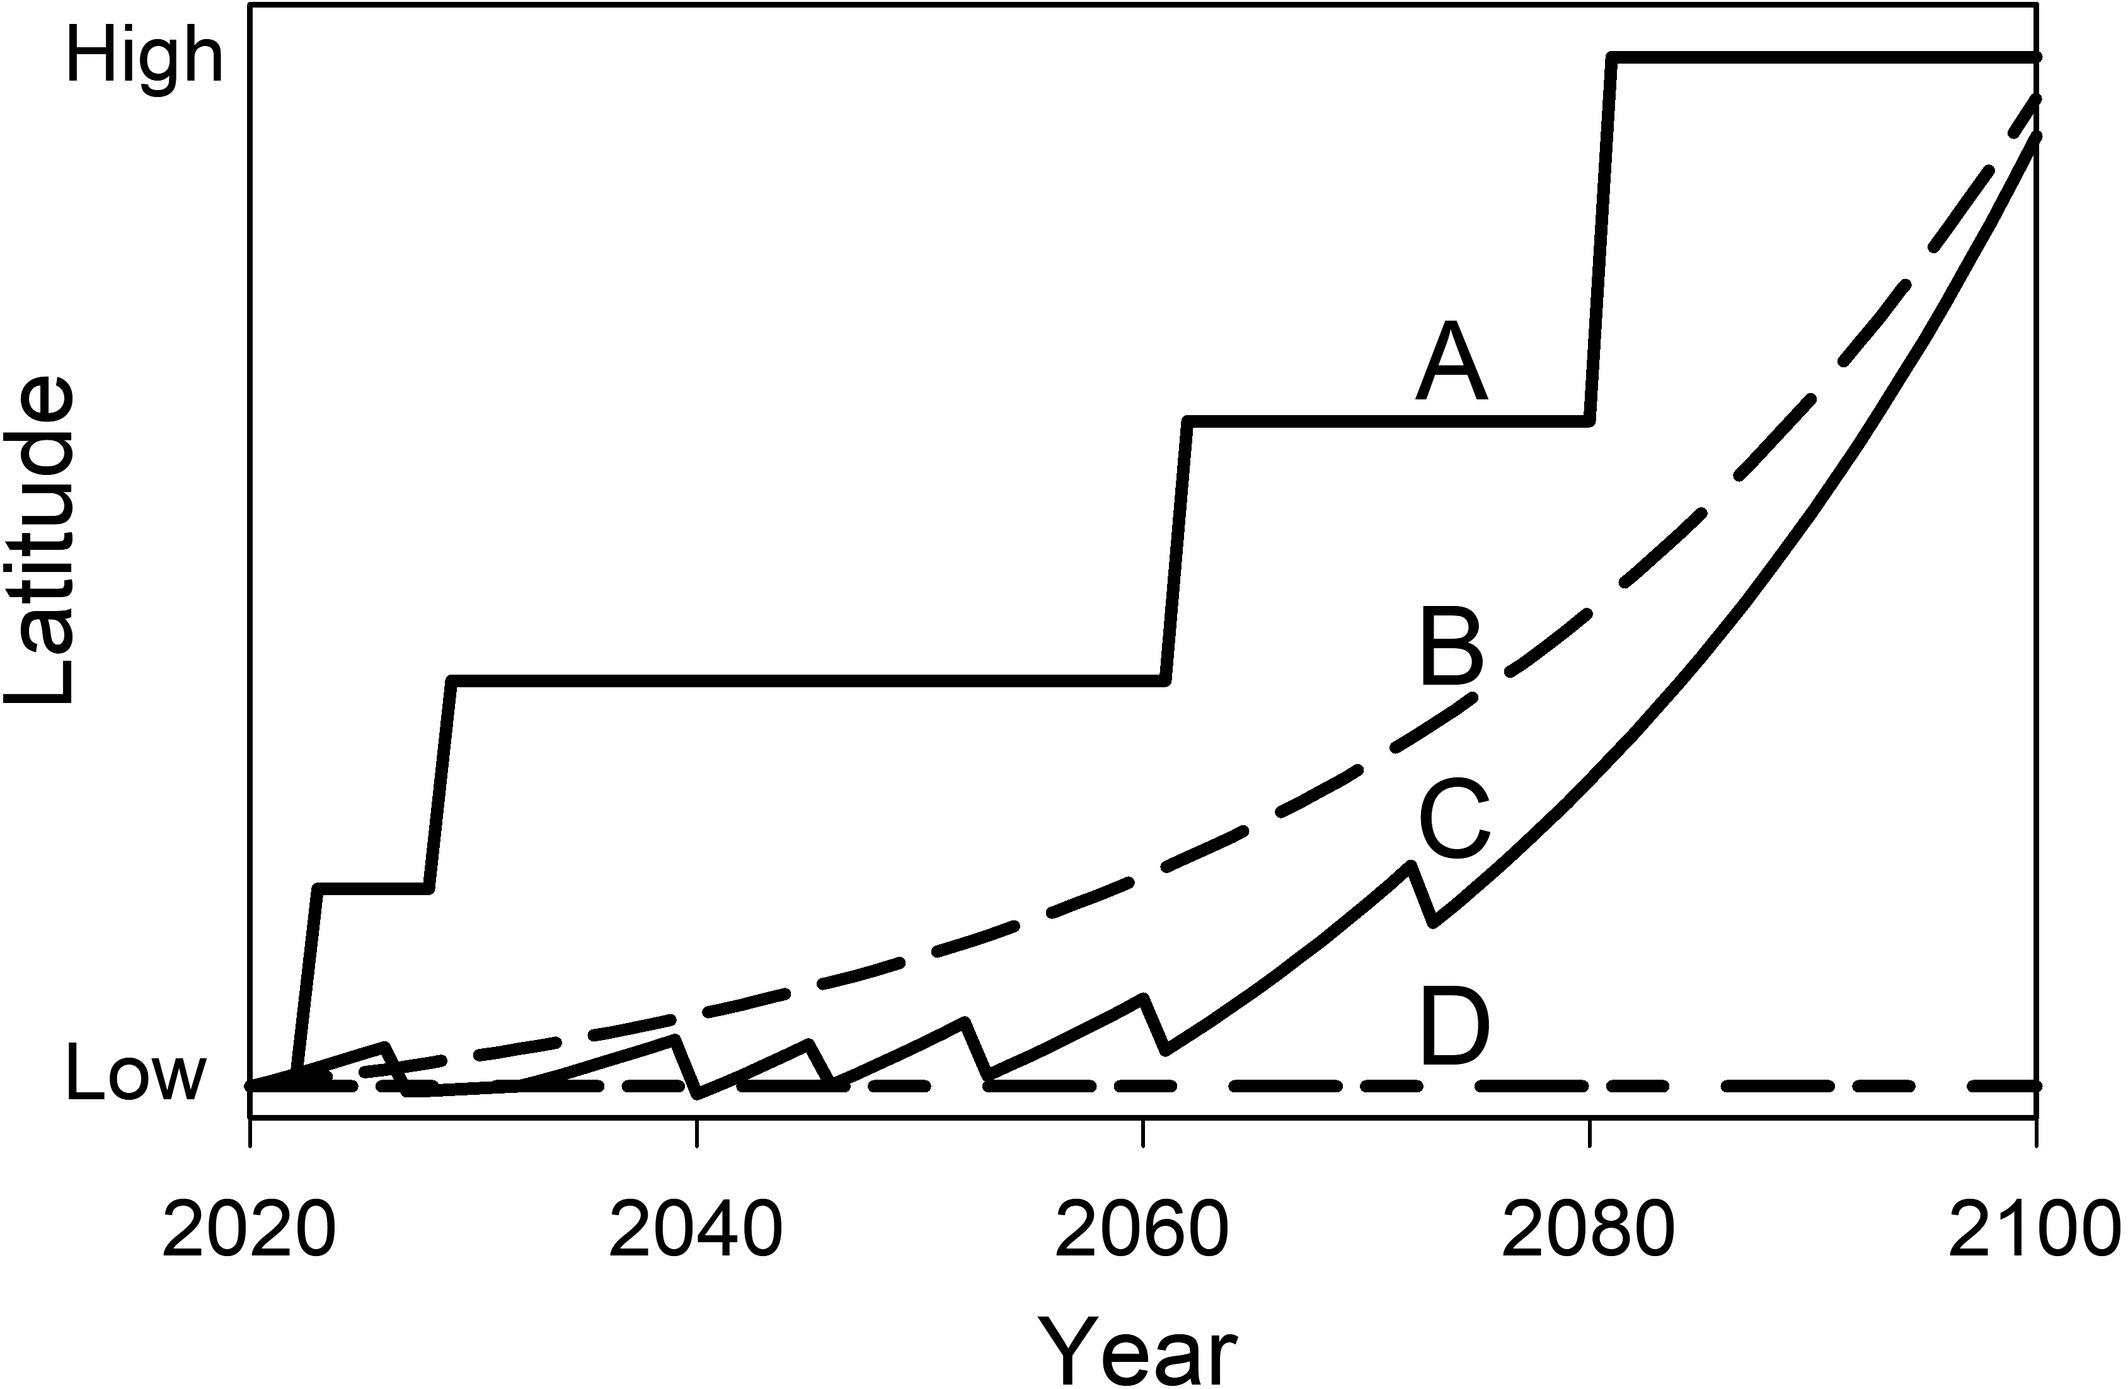 Osland et al 2021 poleward range expansion pathways